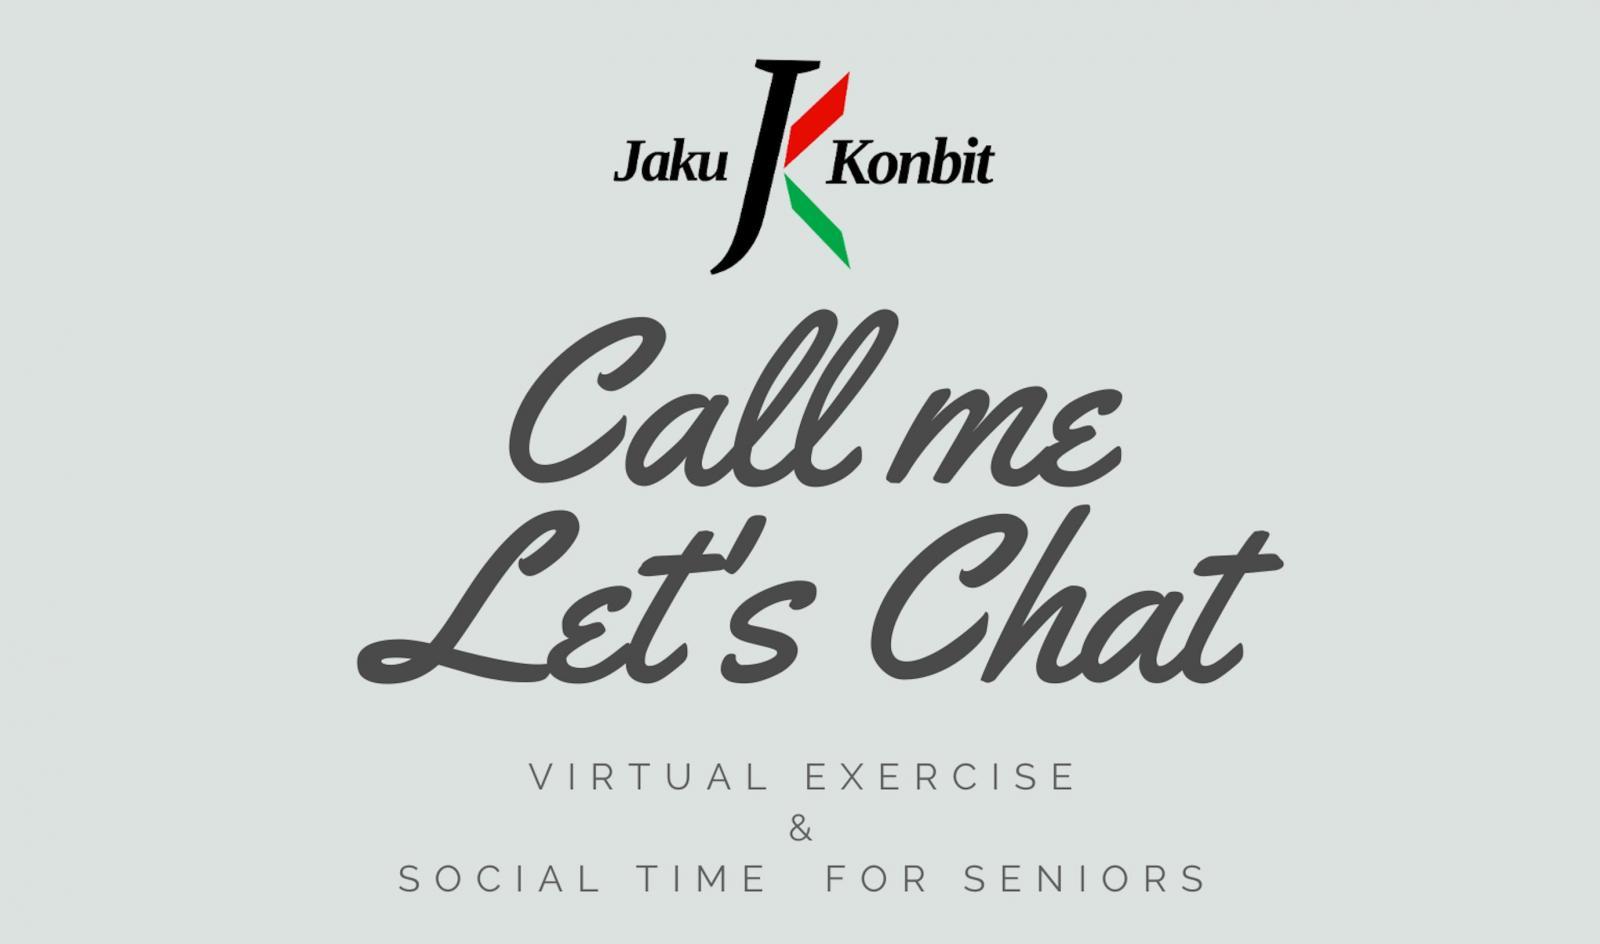 Bronson-centre-bronson-hub-jaku-konbit-call-me-lets-chat